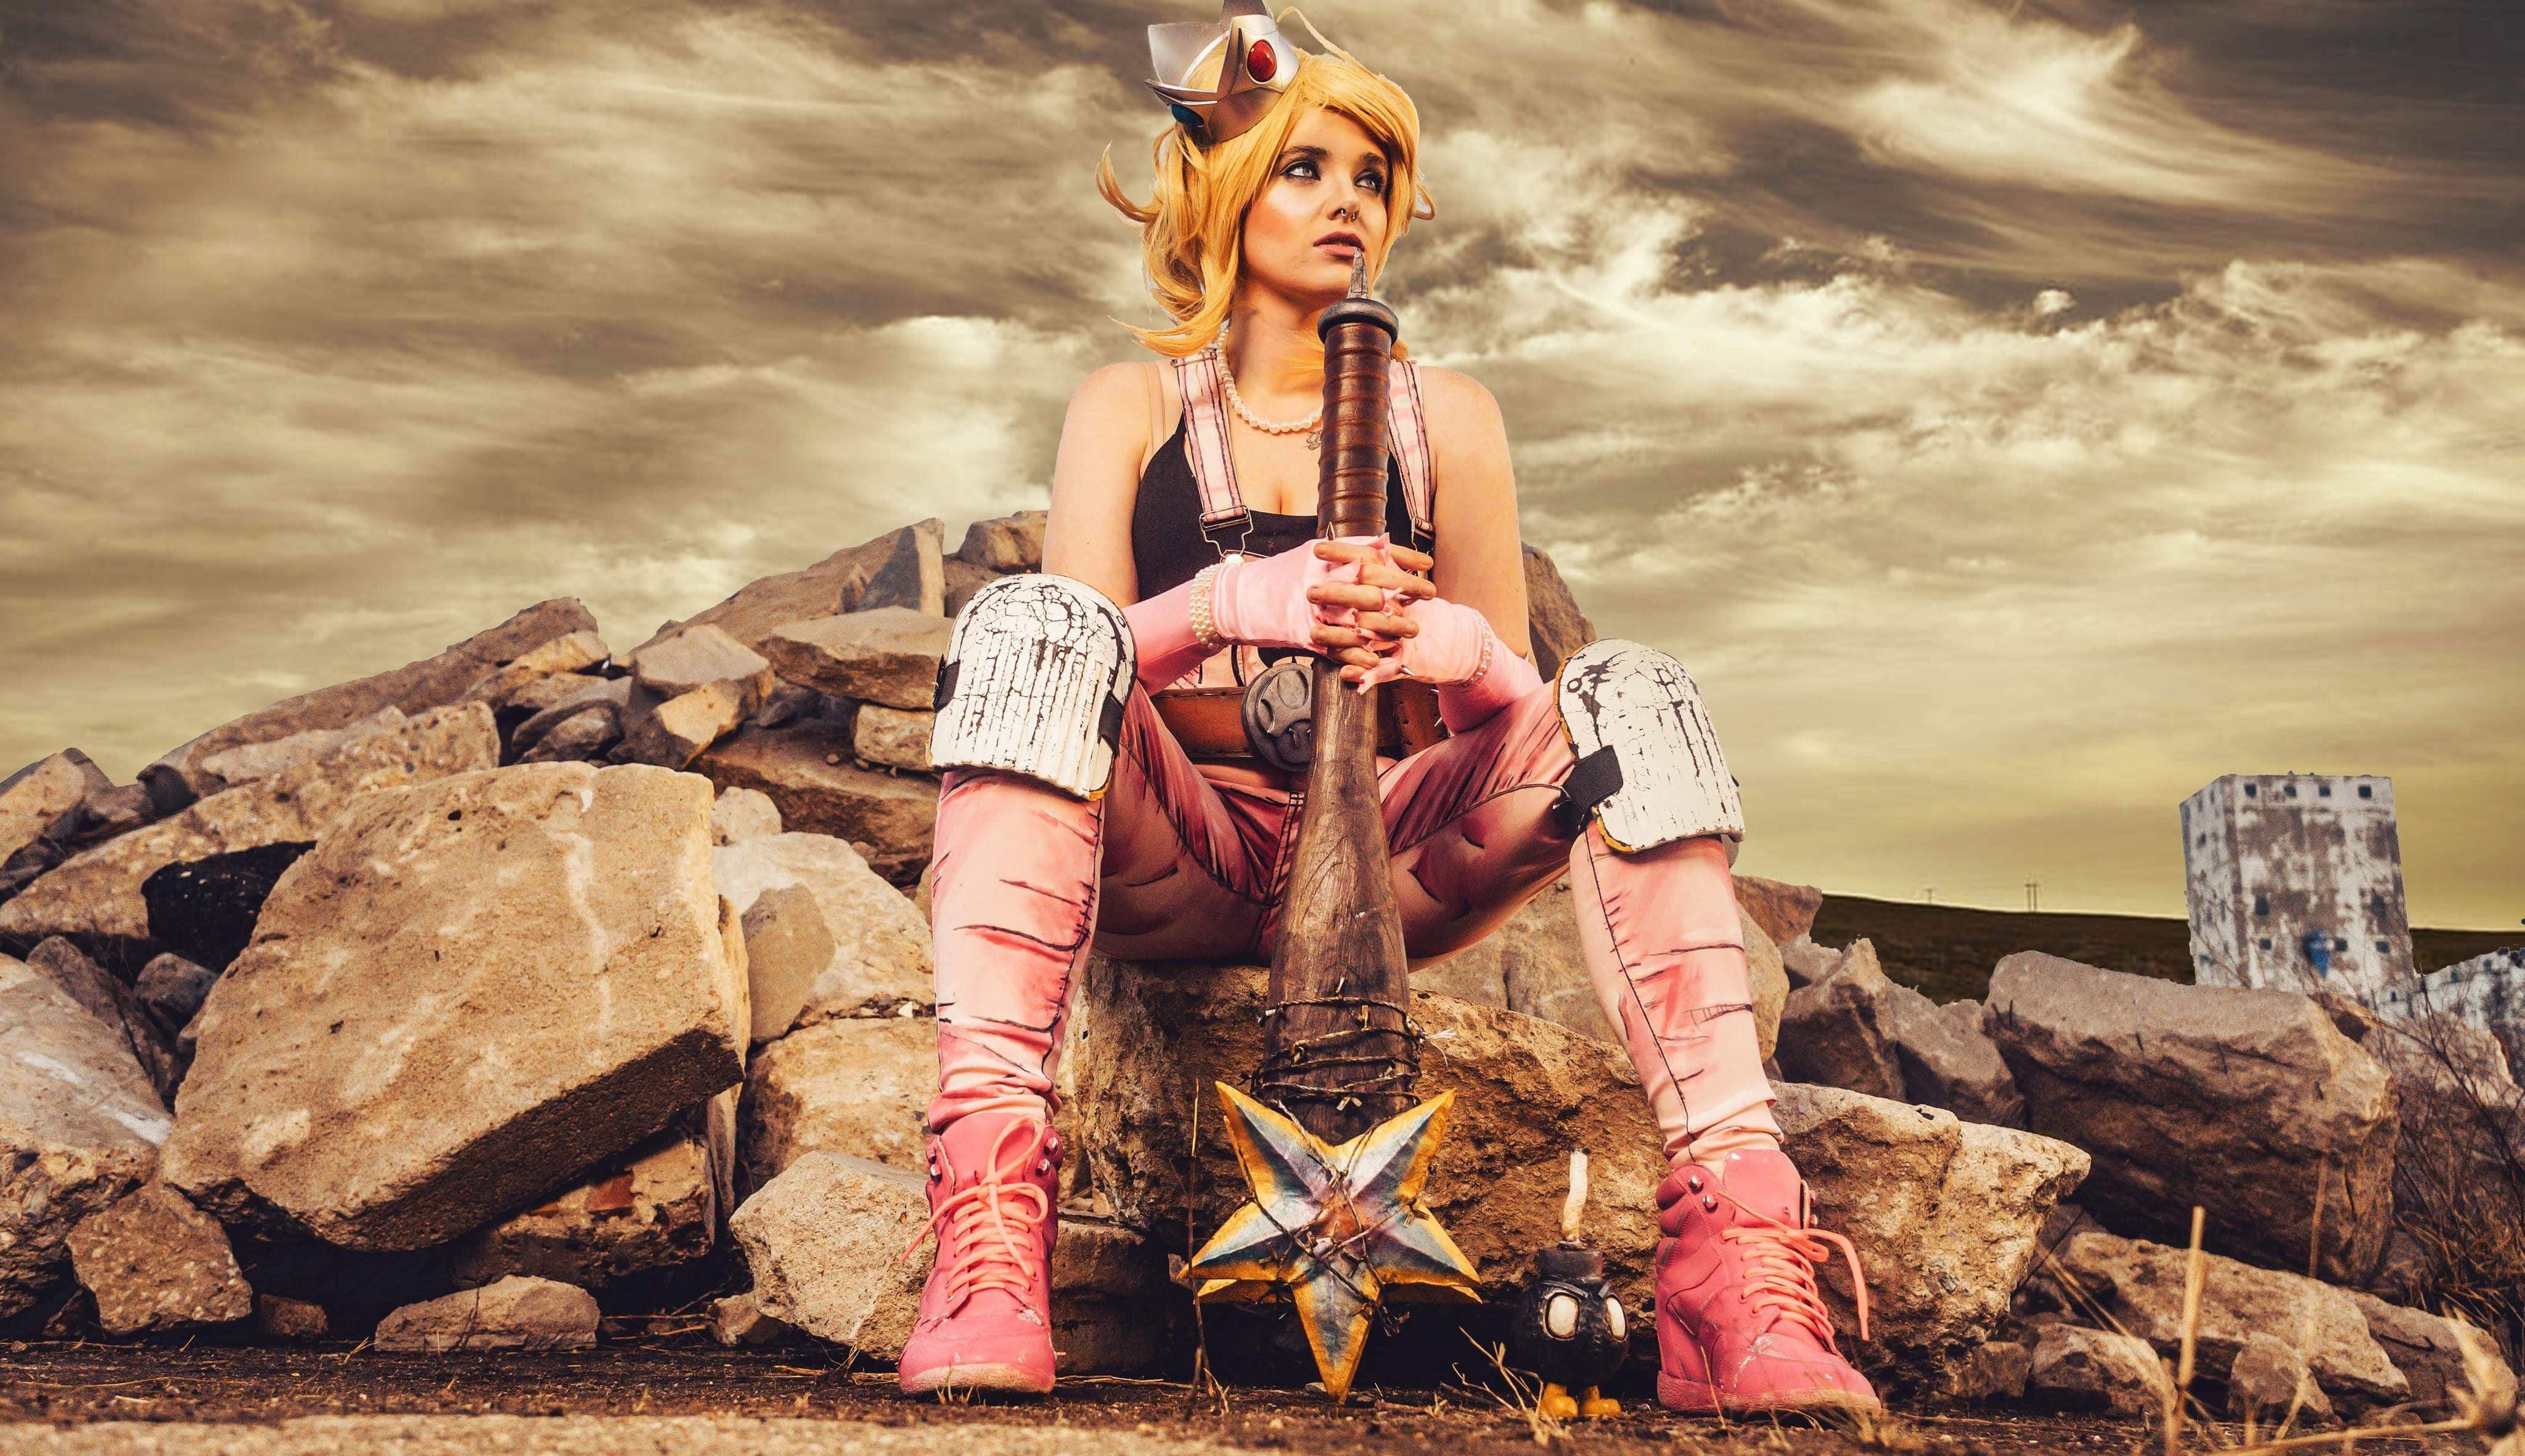 Princess Peach Is Ready For The Apocalypse